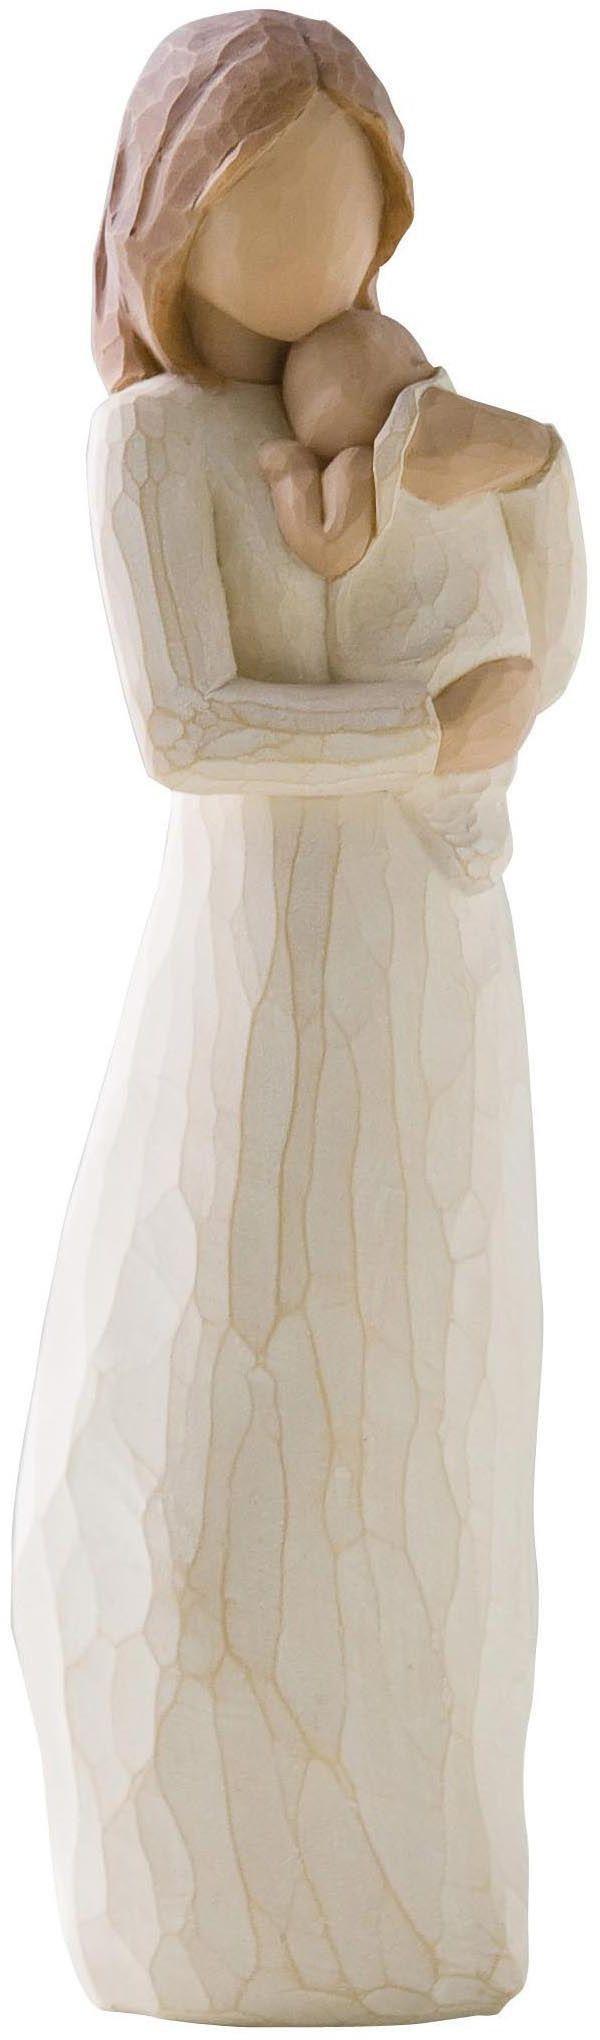 Willow Tree Angel of Mine Figurine. lowest price